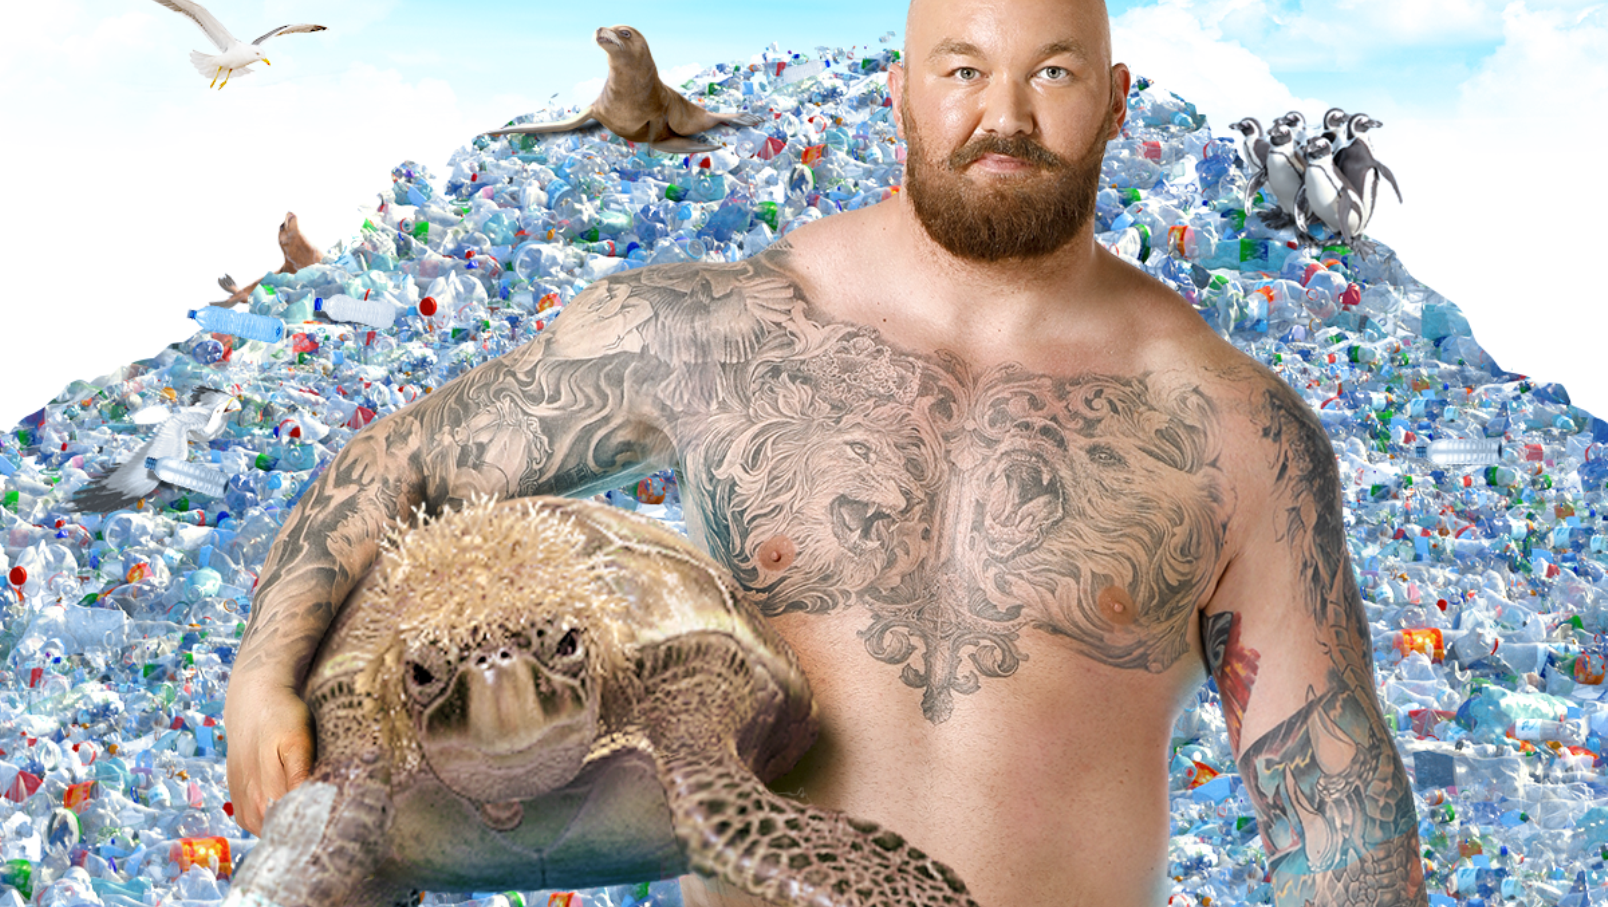 Sodastream Enlists Celebrities In War On Plastic Pollution photo